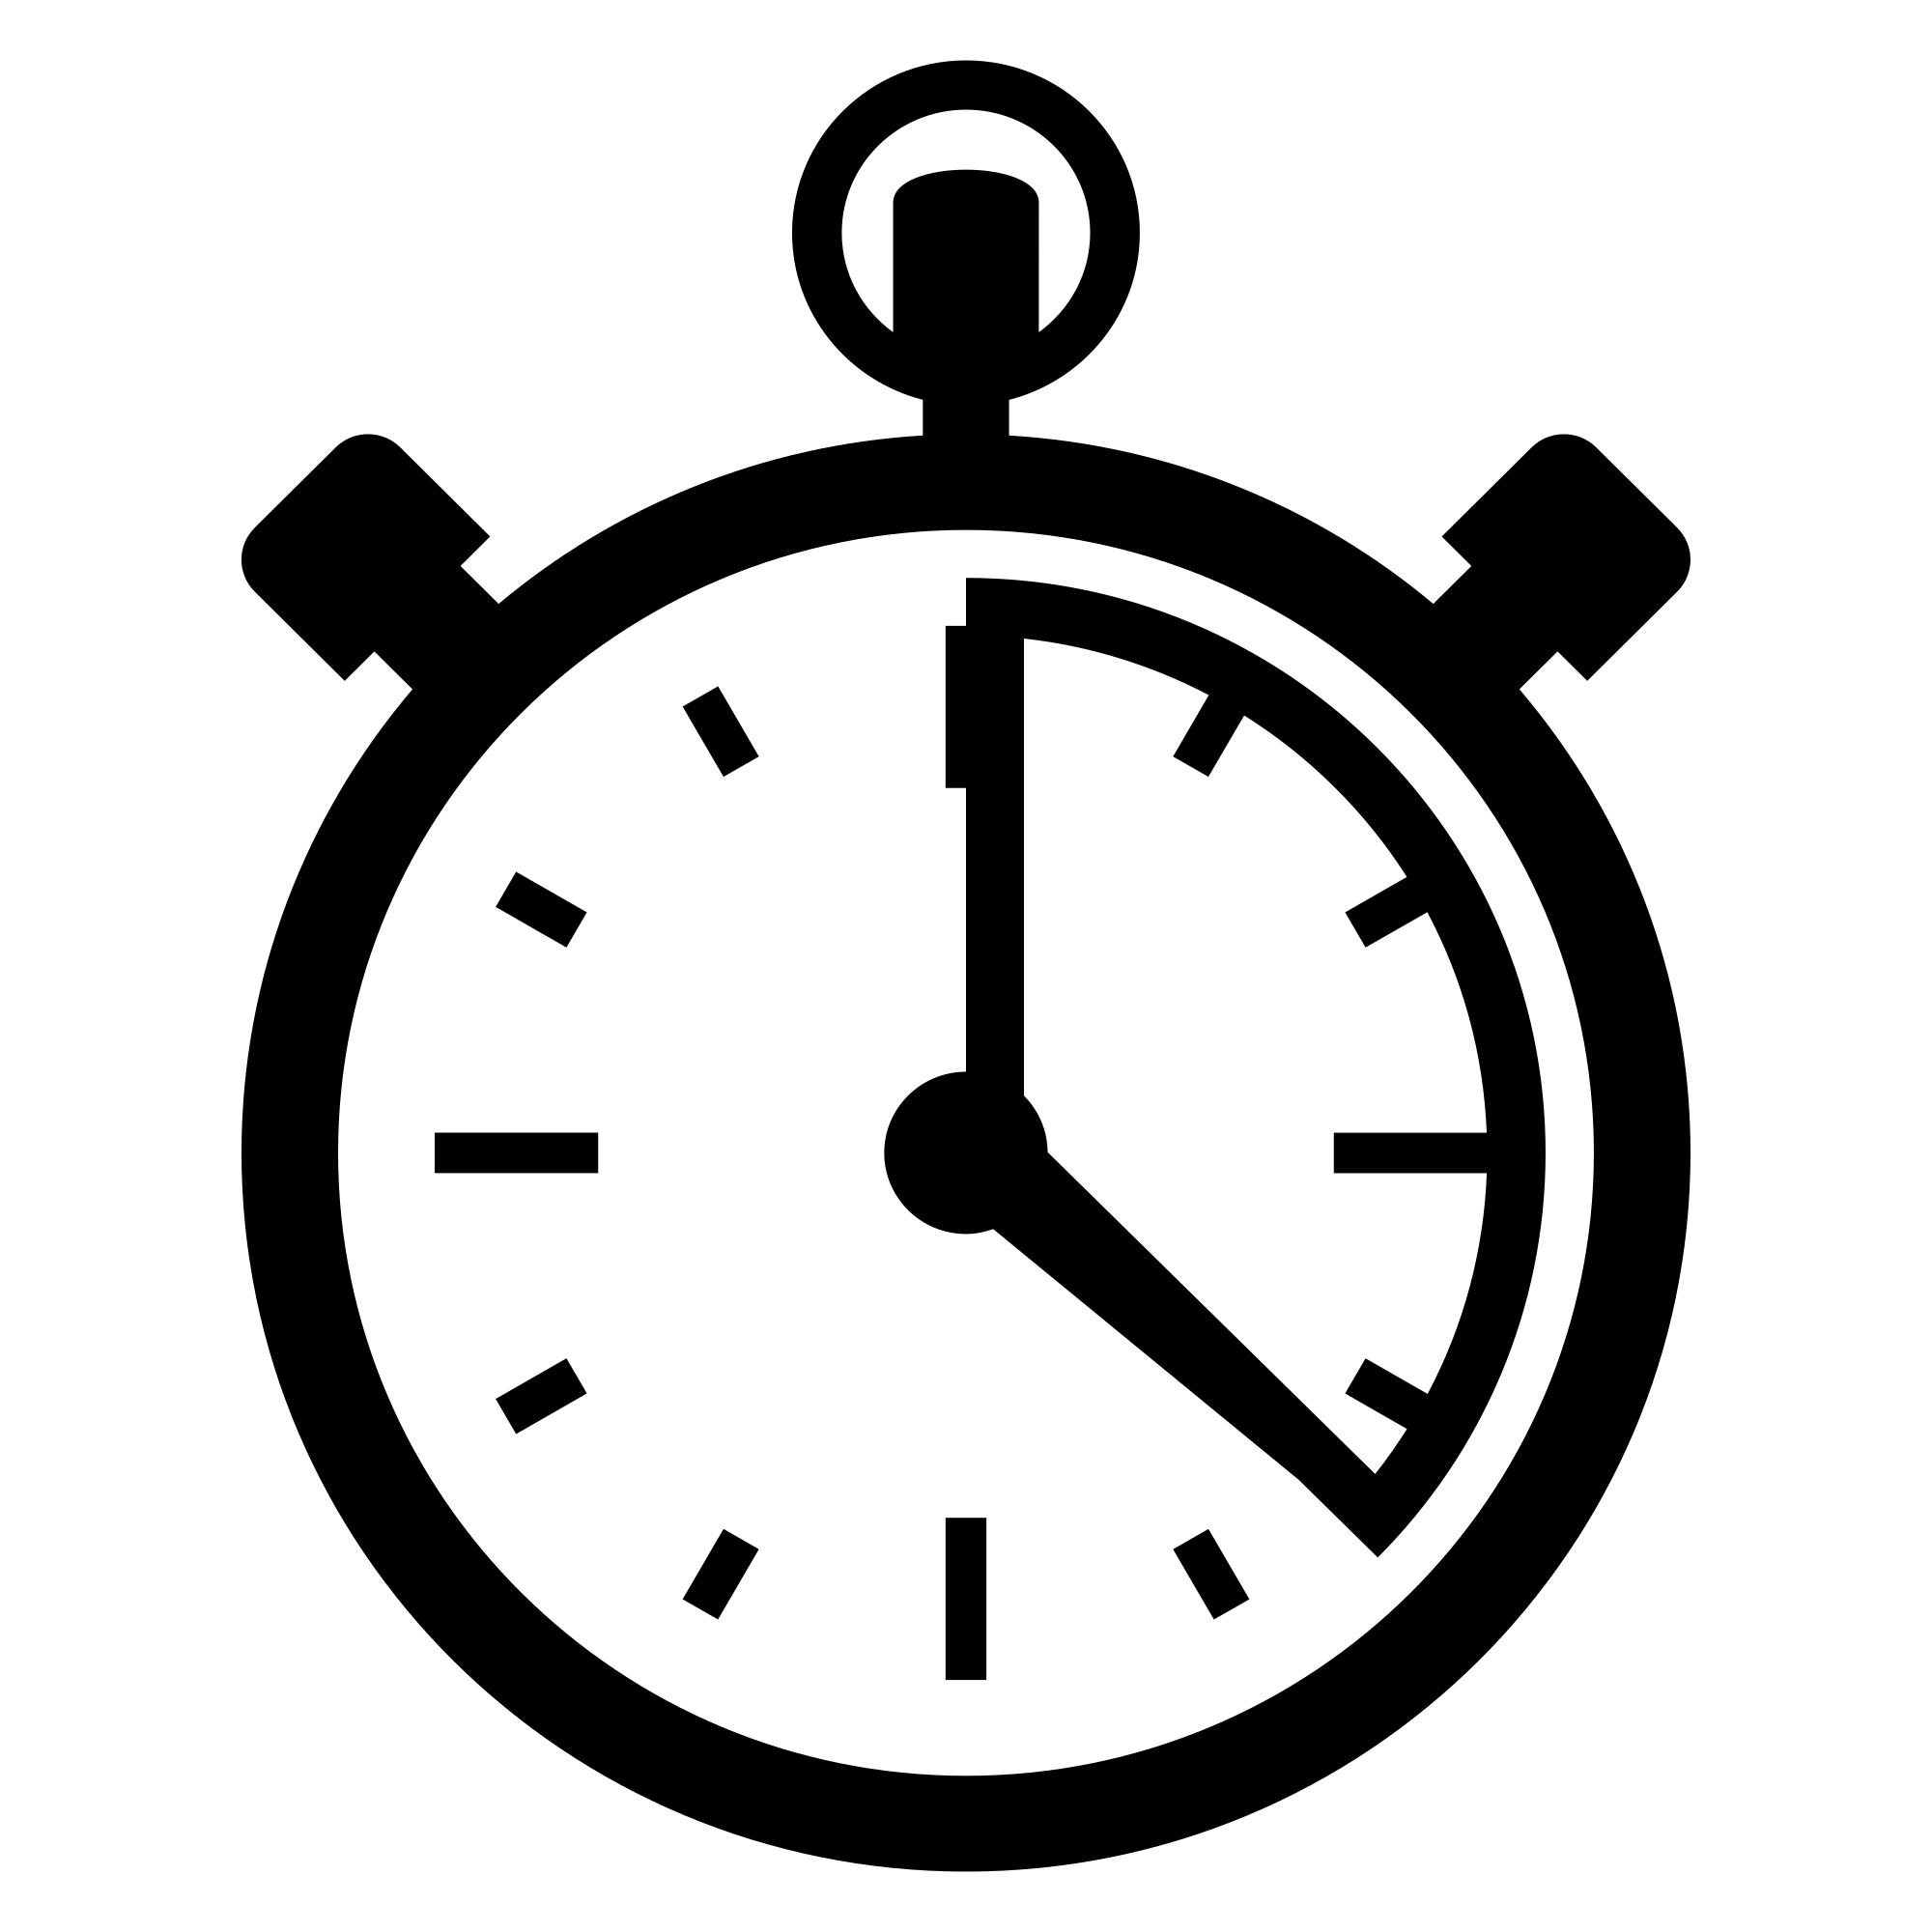 File emojione bw f. Stopwatch clipart emoji